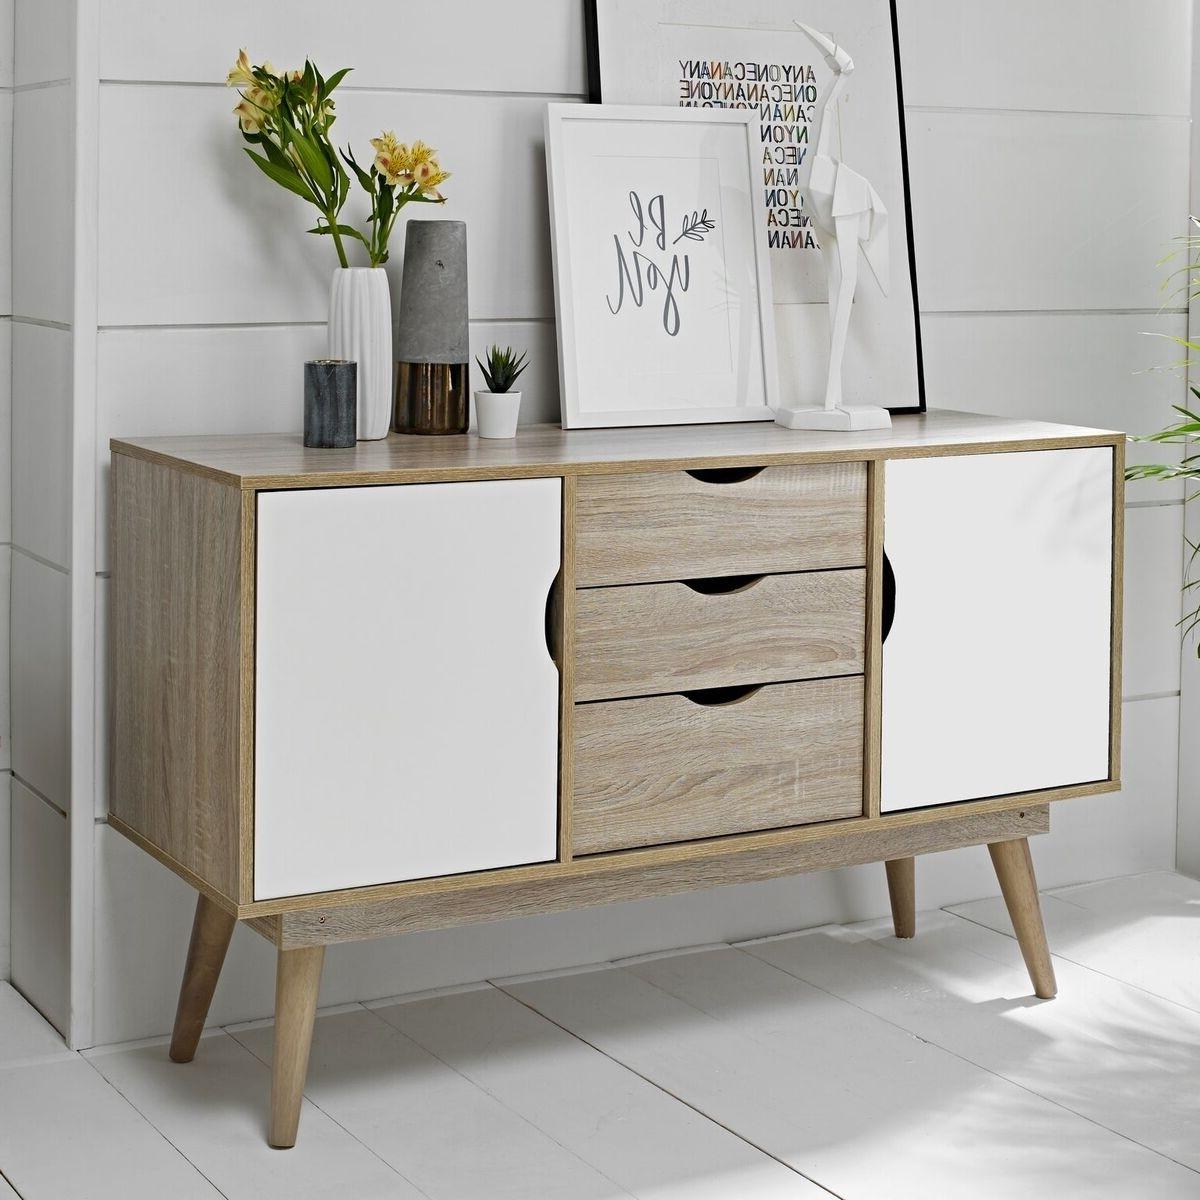 Trendy White Wash 3 Door 3 Drawer Sideboards Regarding Lpd Scandi 2 Door 3 Drawer Oak Sideboard – White Or Grey (View 13 of 20)